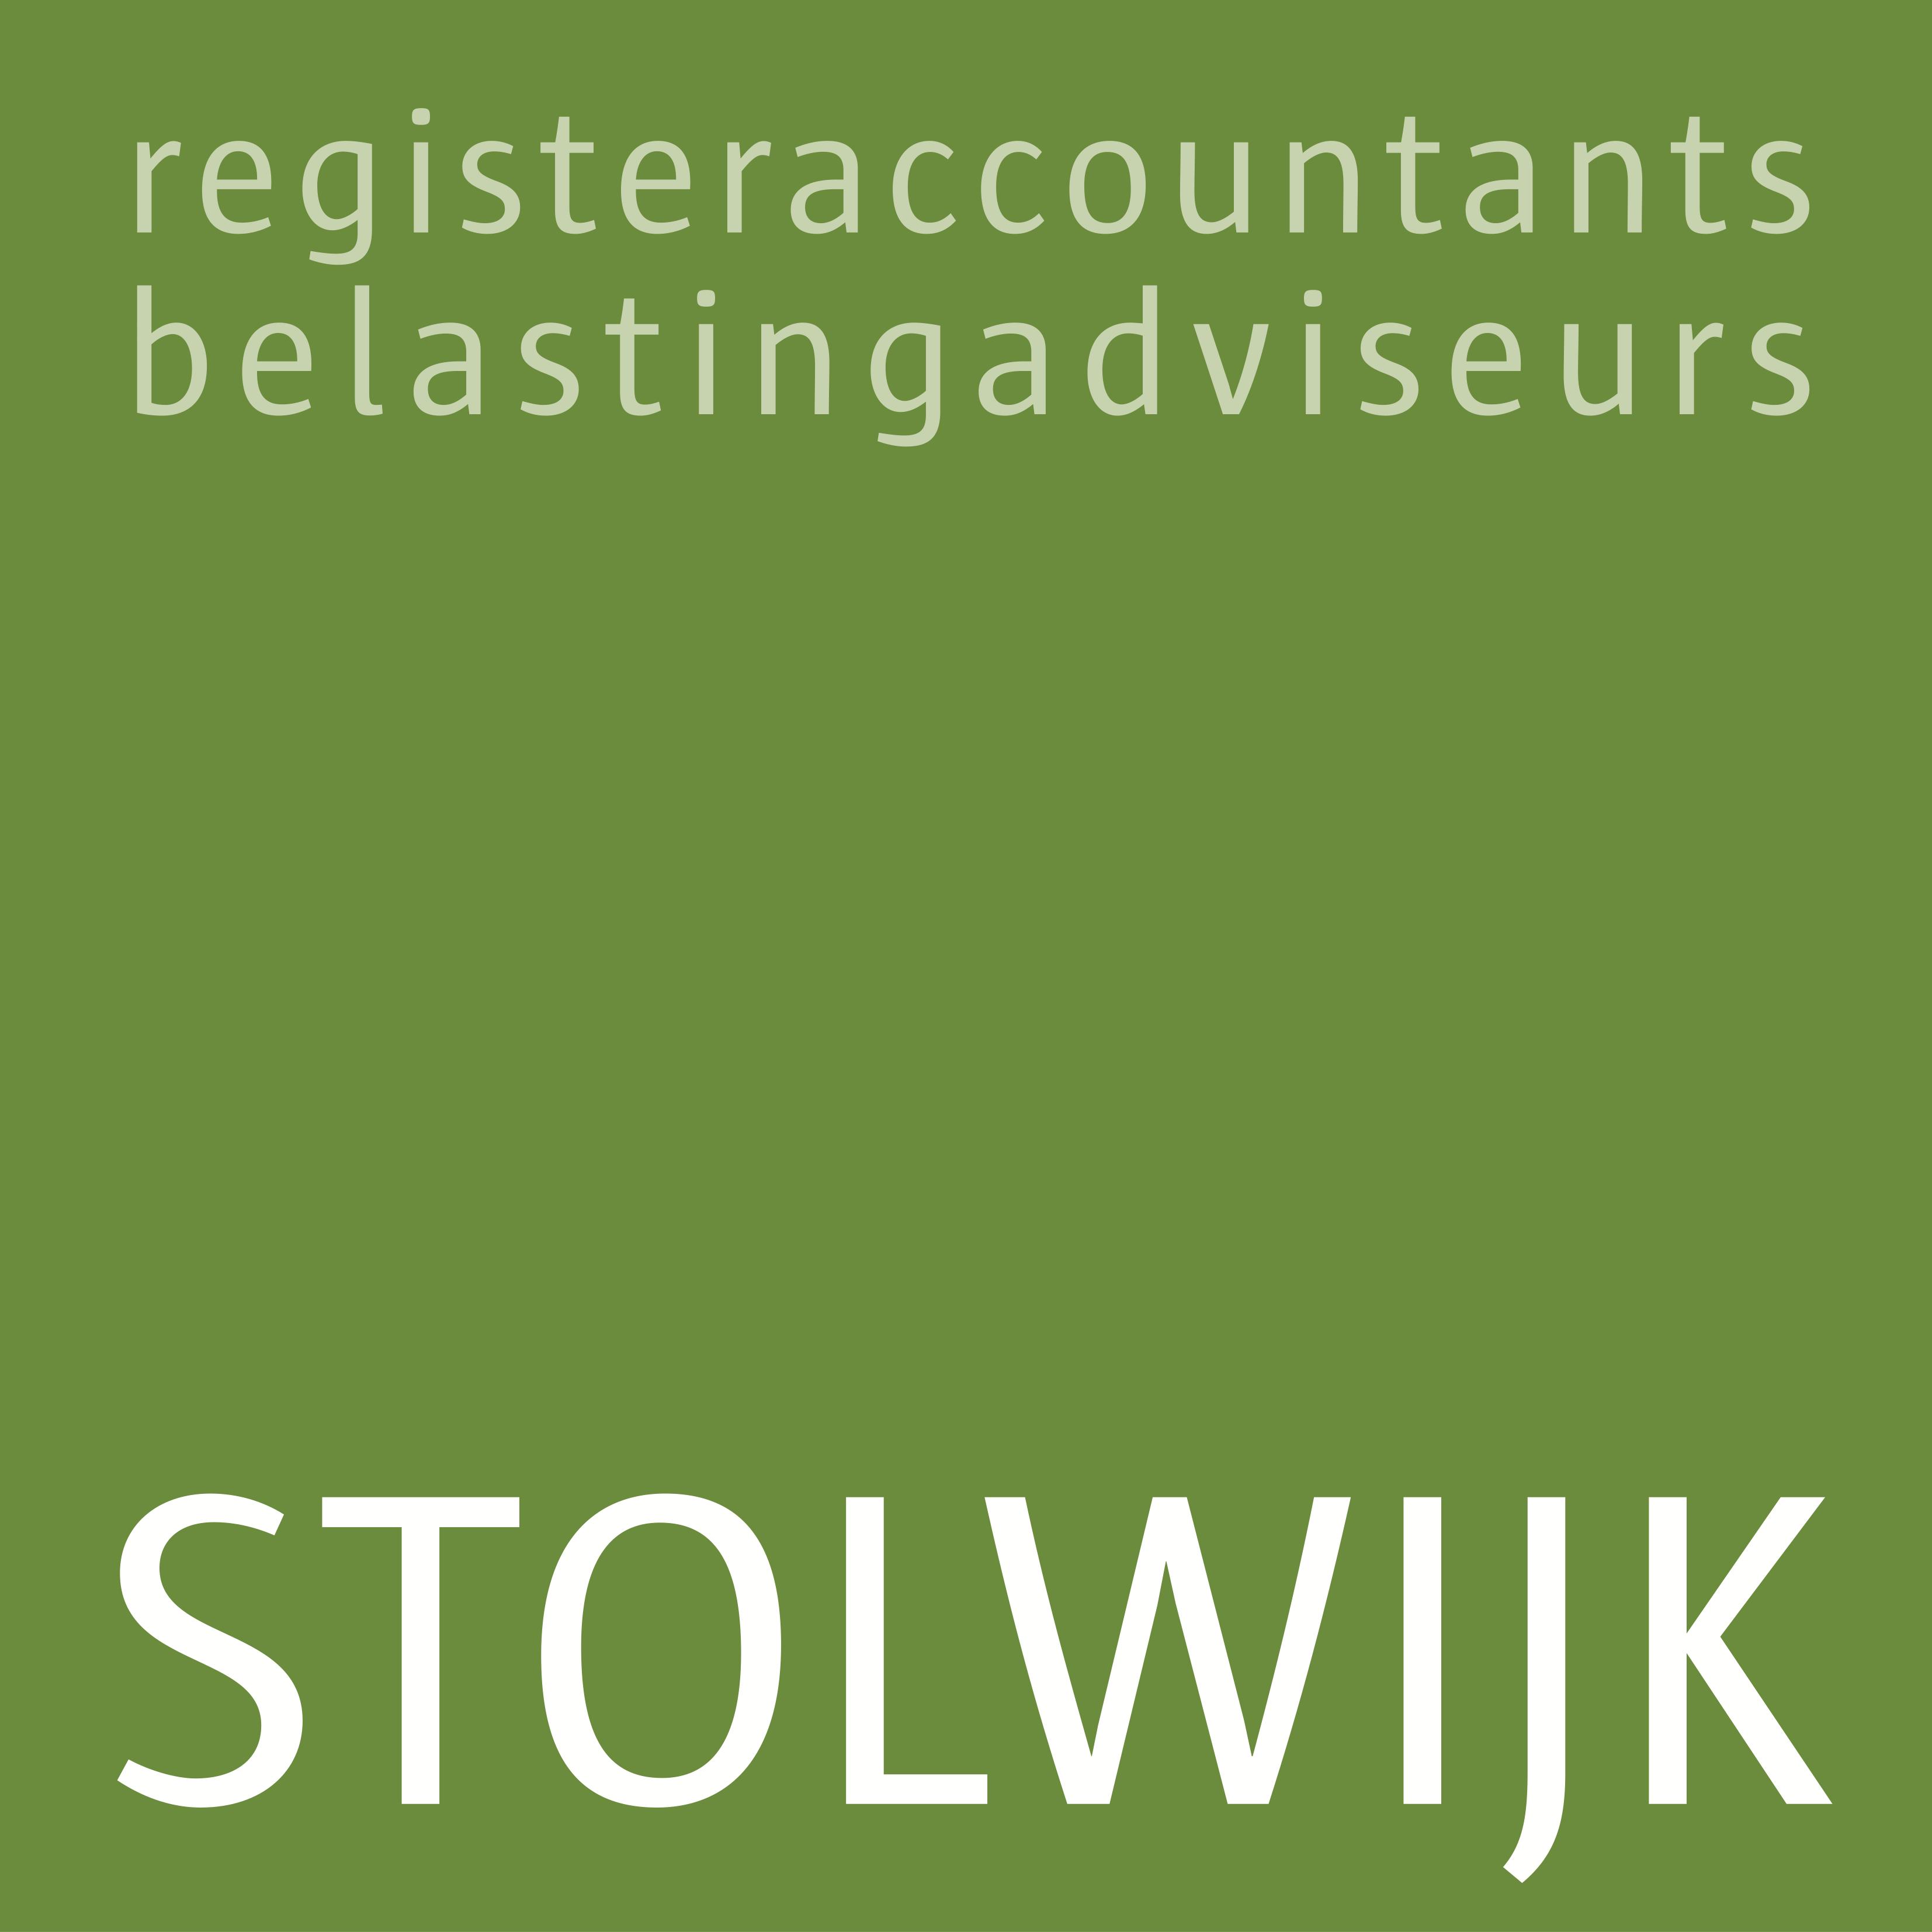 Stolwijk